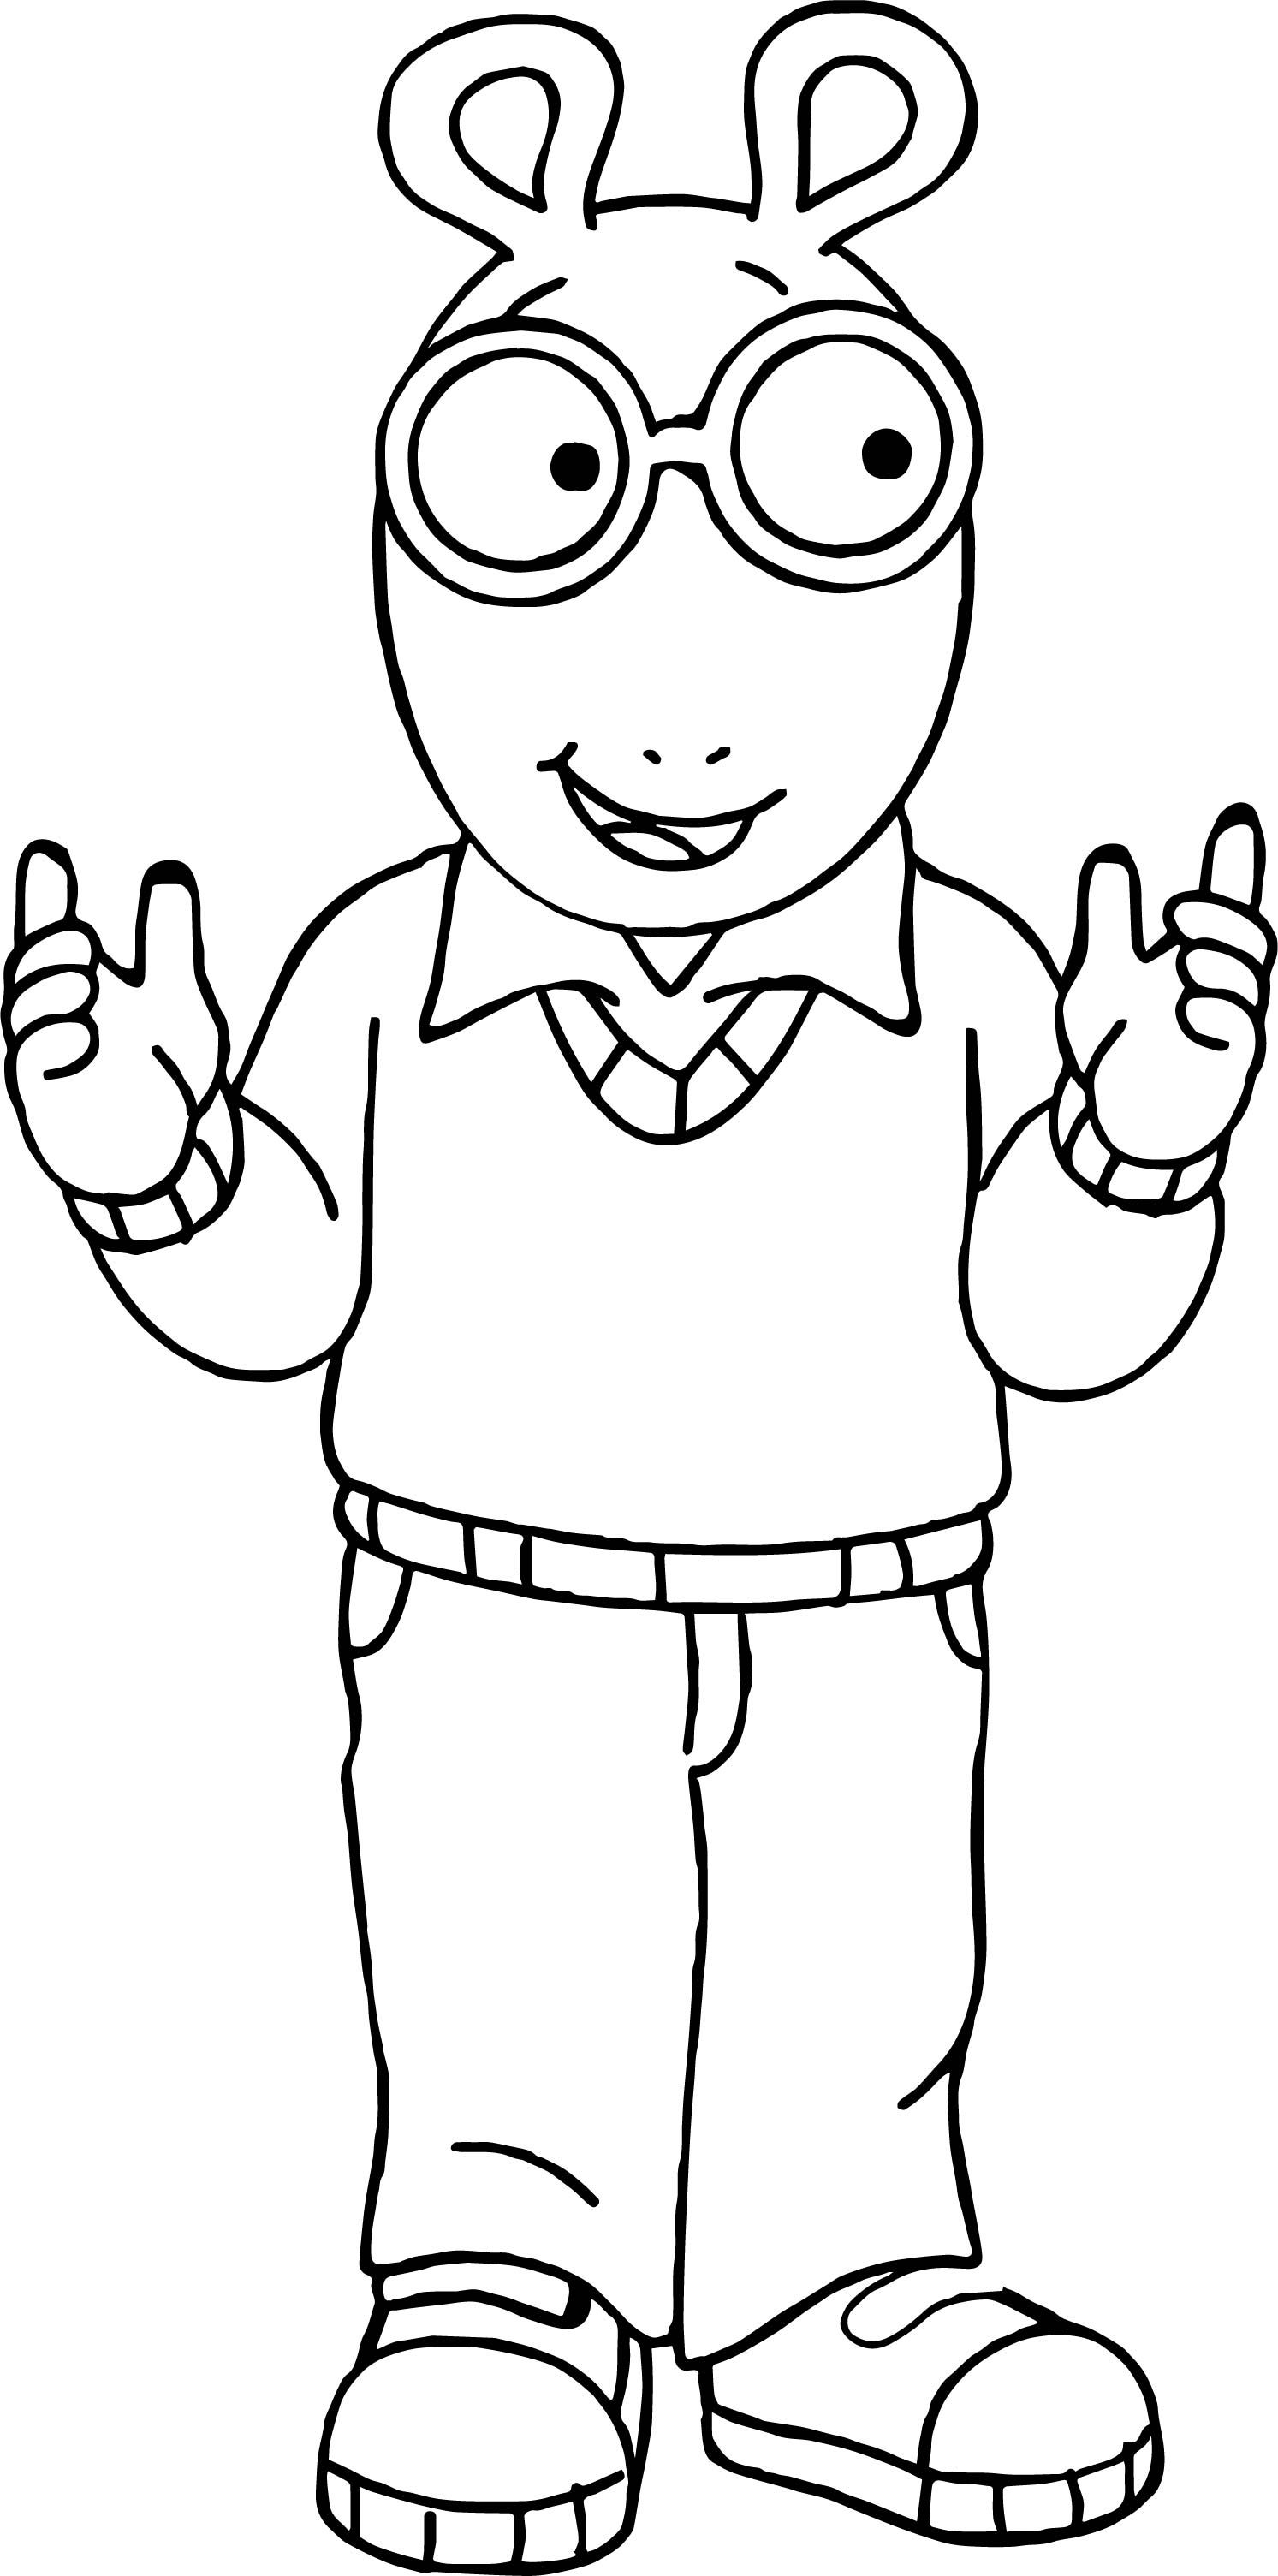 Cool Arthur Friend Coloring Page Coloring Pages Boy Coloring Coloring Pages For Kids